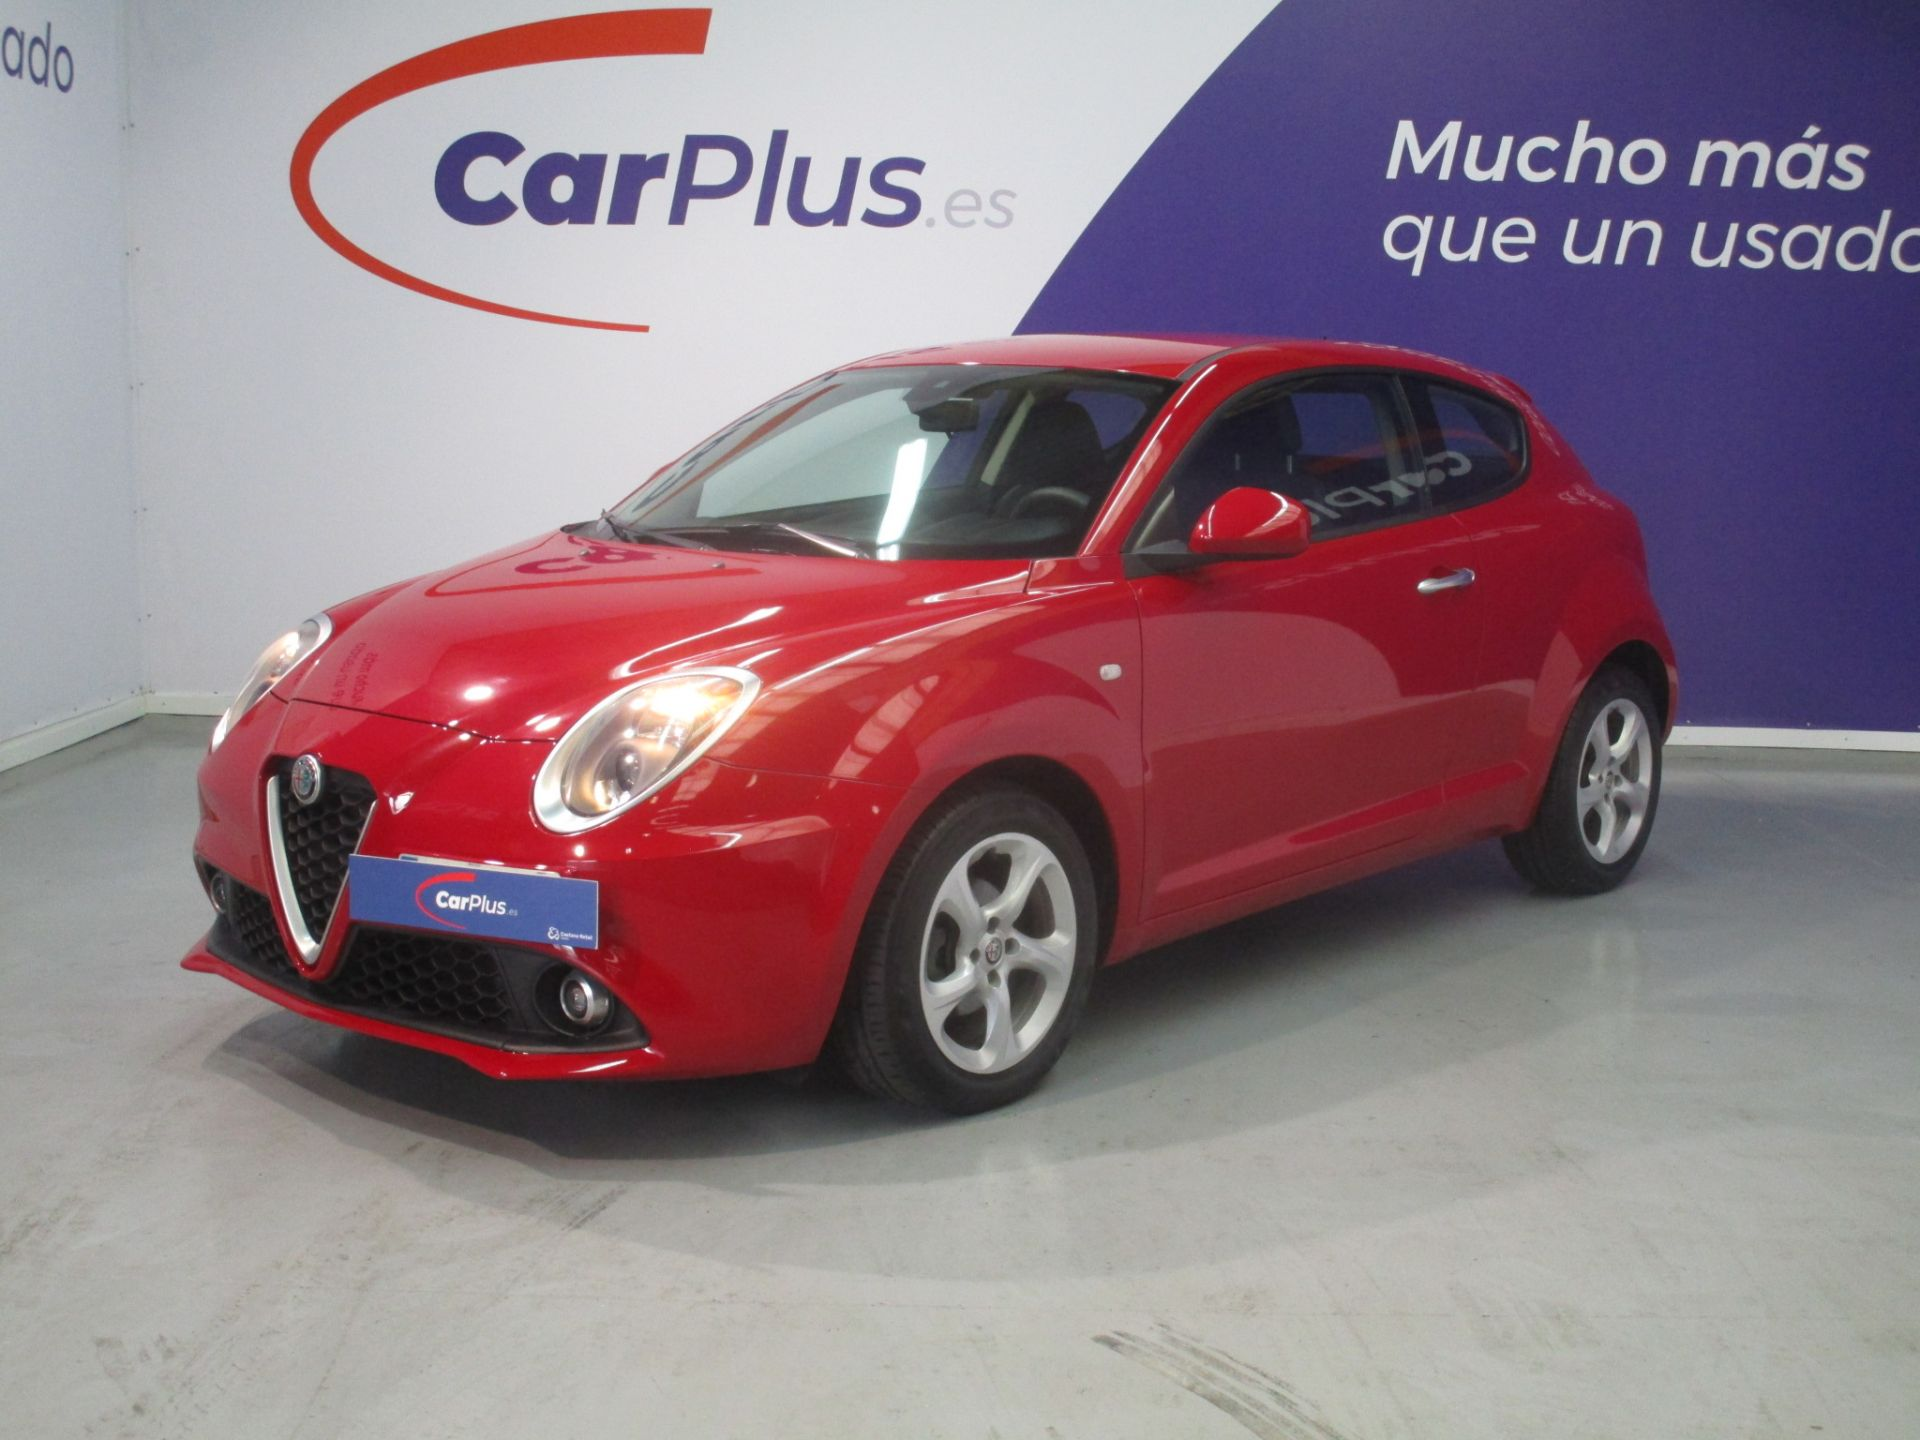 Alfa Romeo Mito 0.9 TWINAIR 77kW (105CV) SUPER segunda mano Madrid